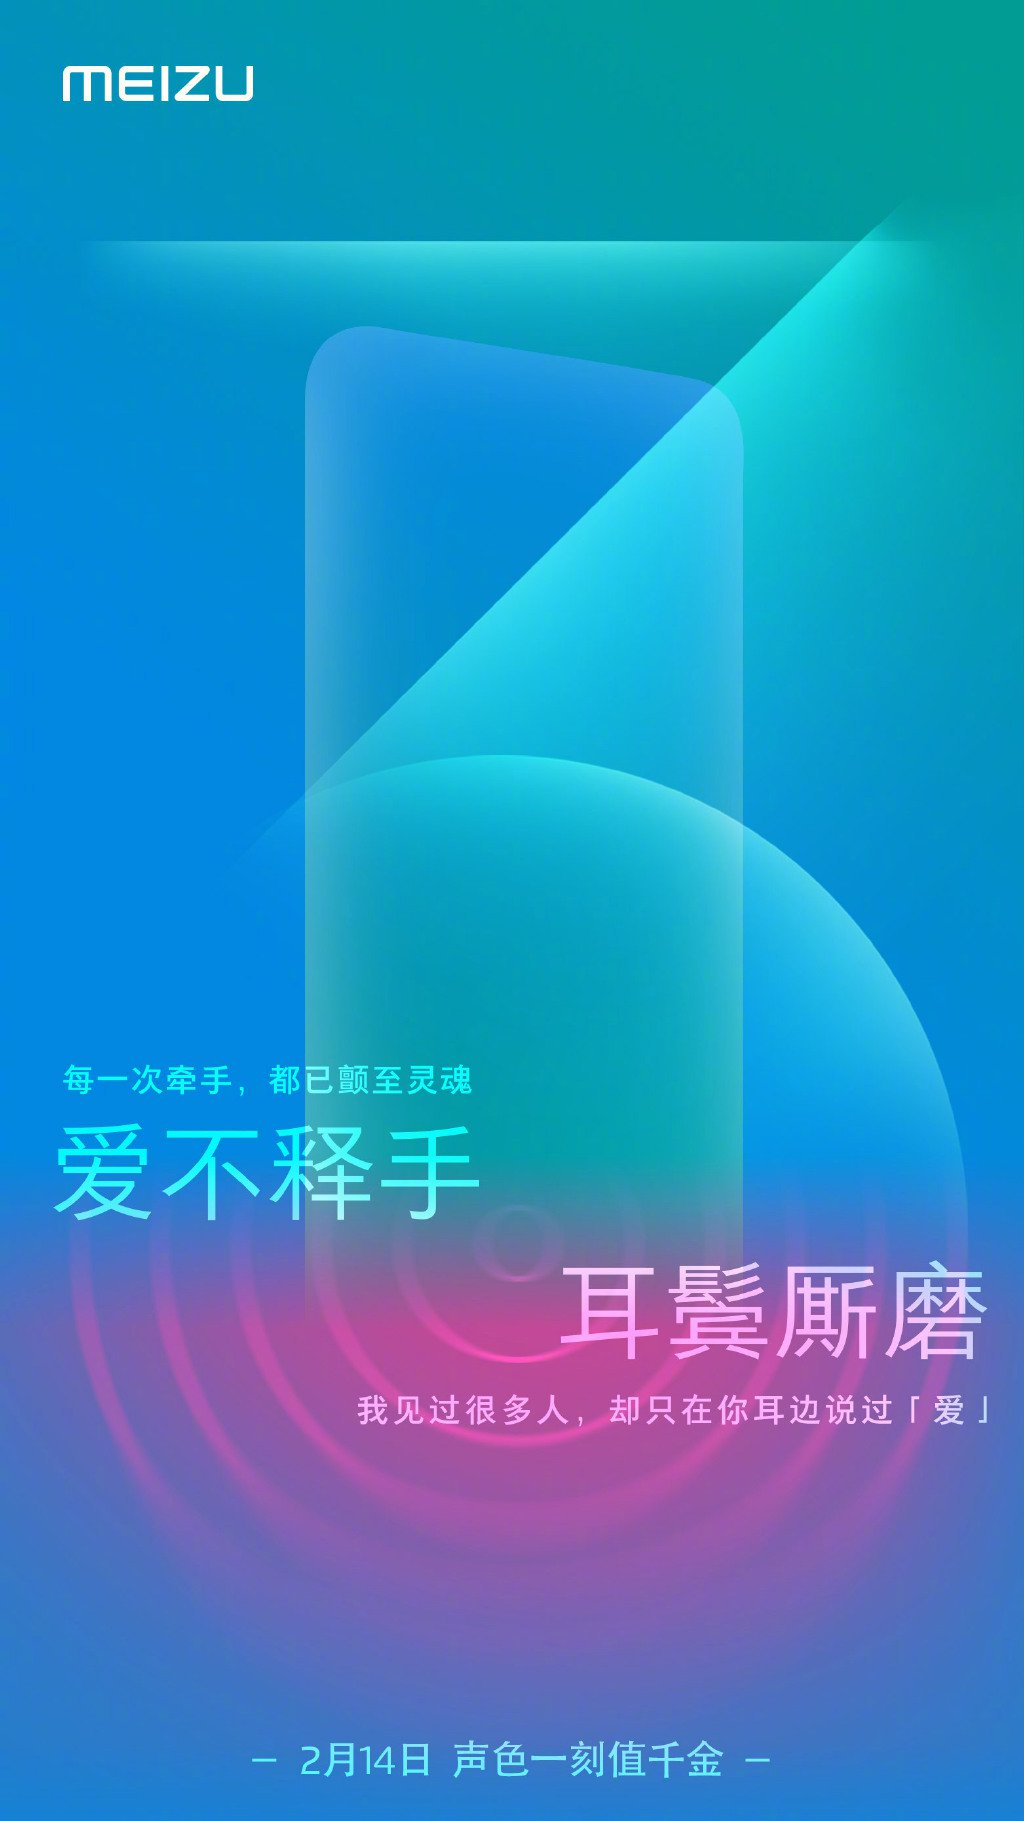 Meizu 14 февраля тизер-постер